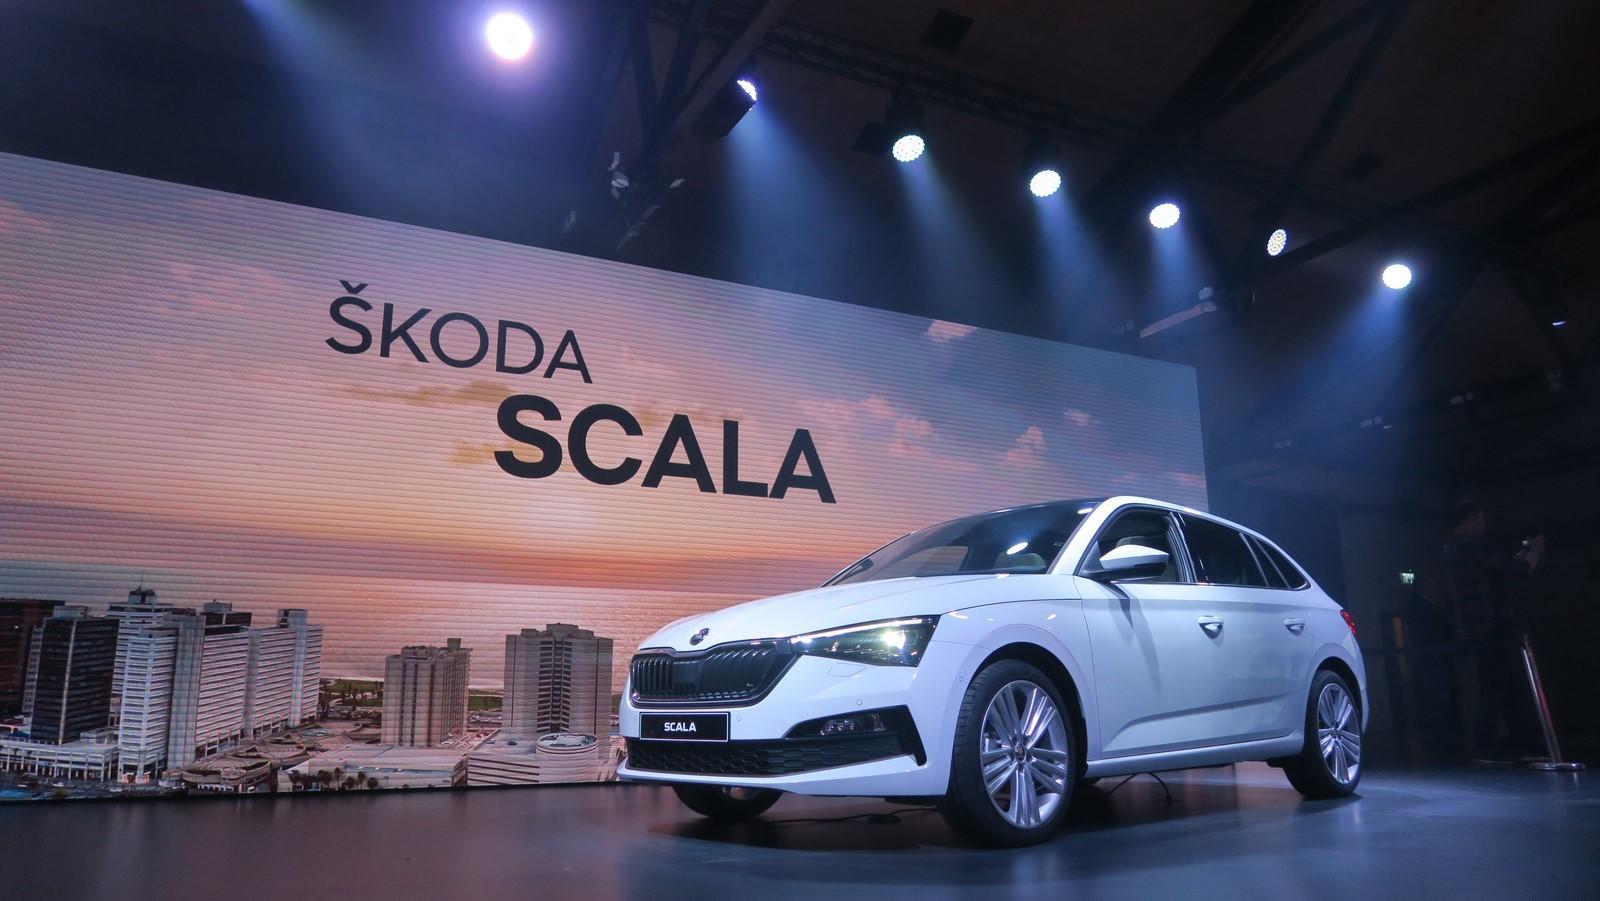 Skoda Scala 2019 TA 2018 FM 92